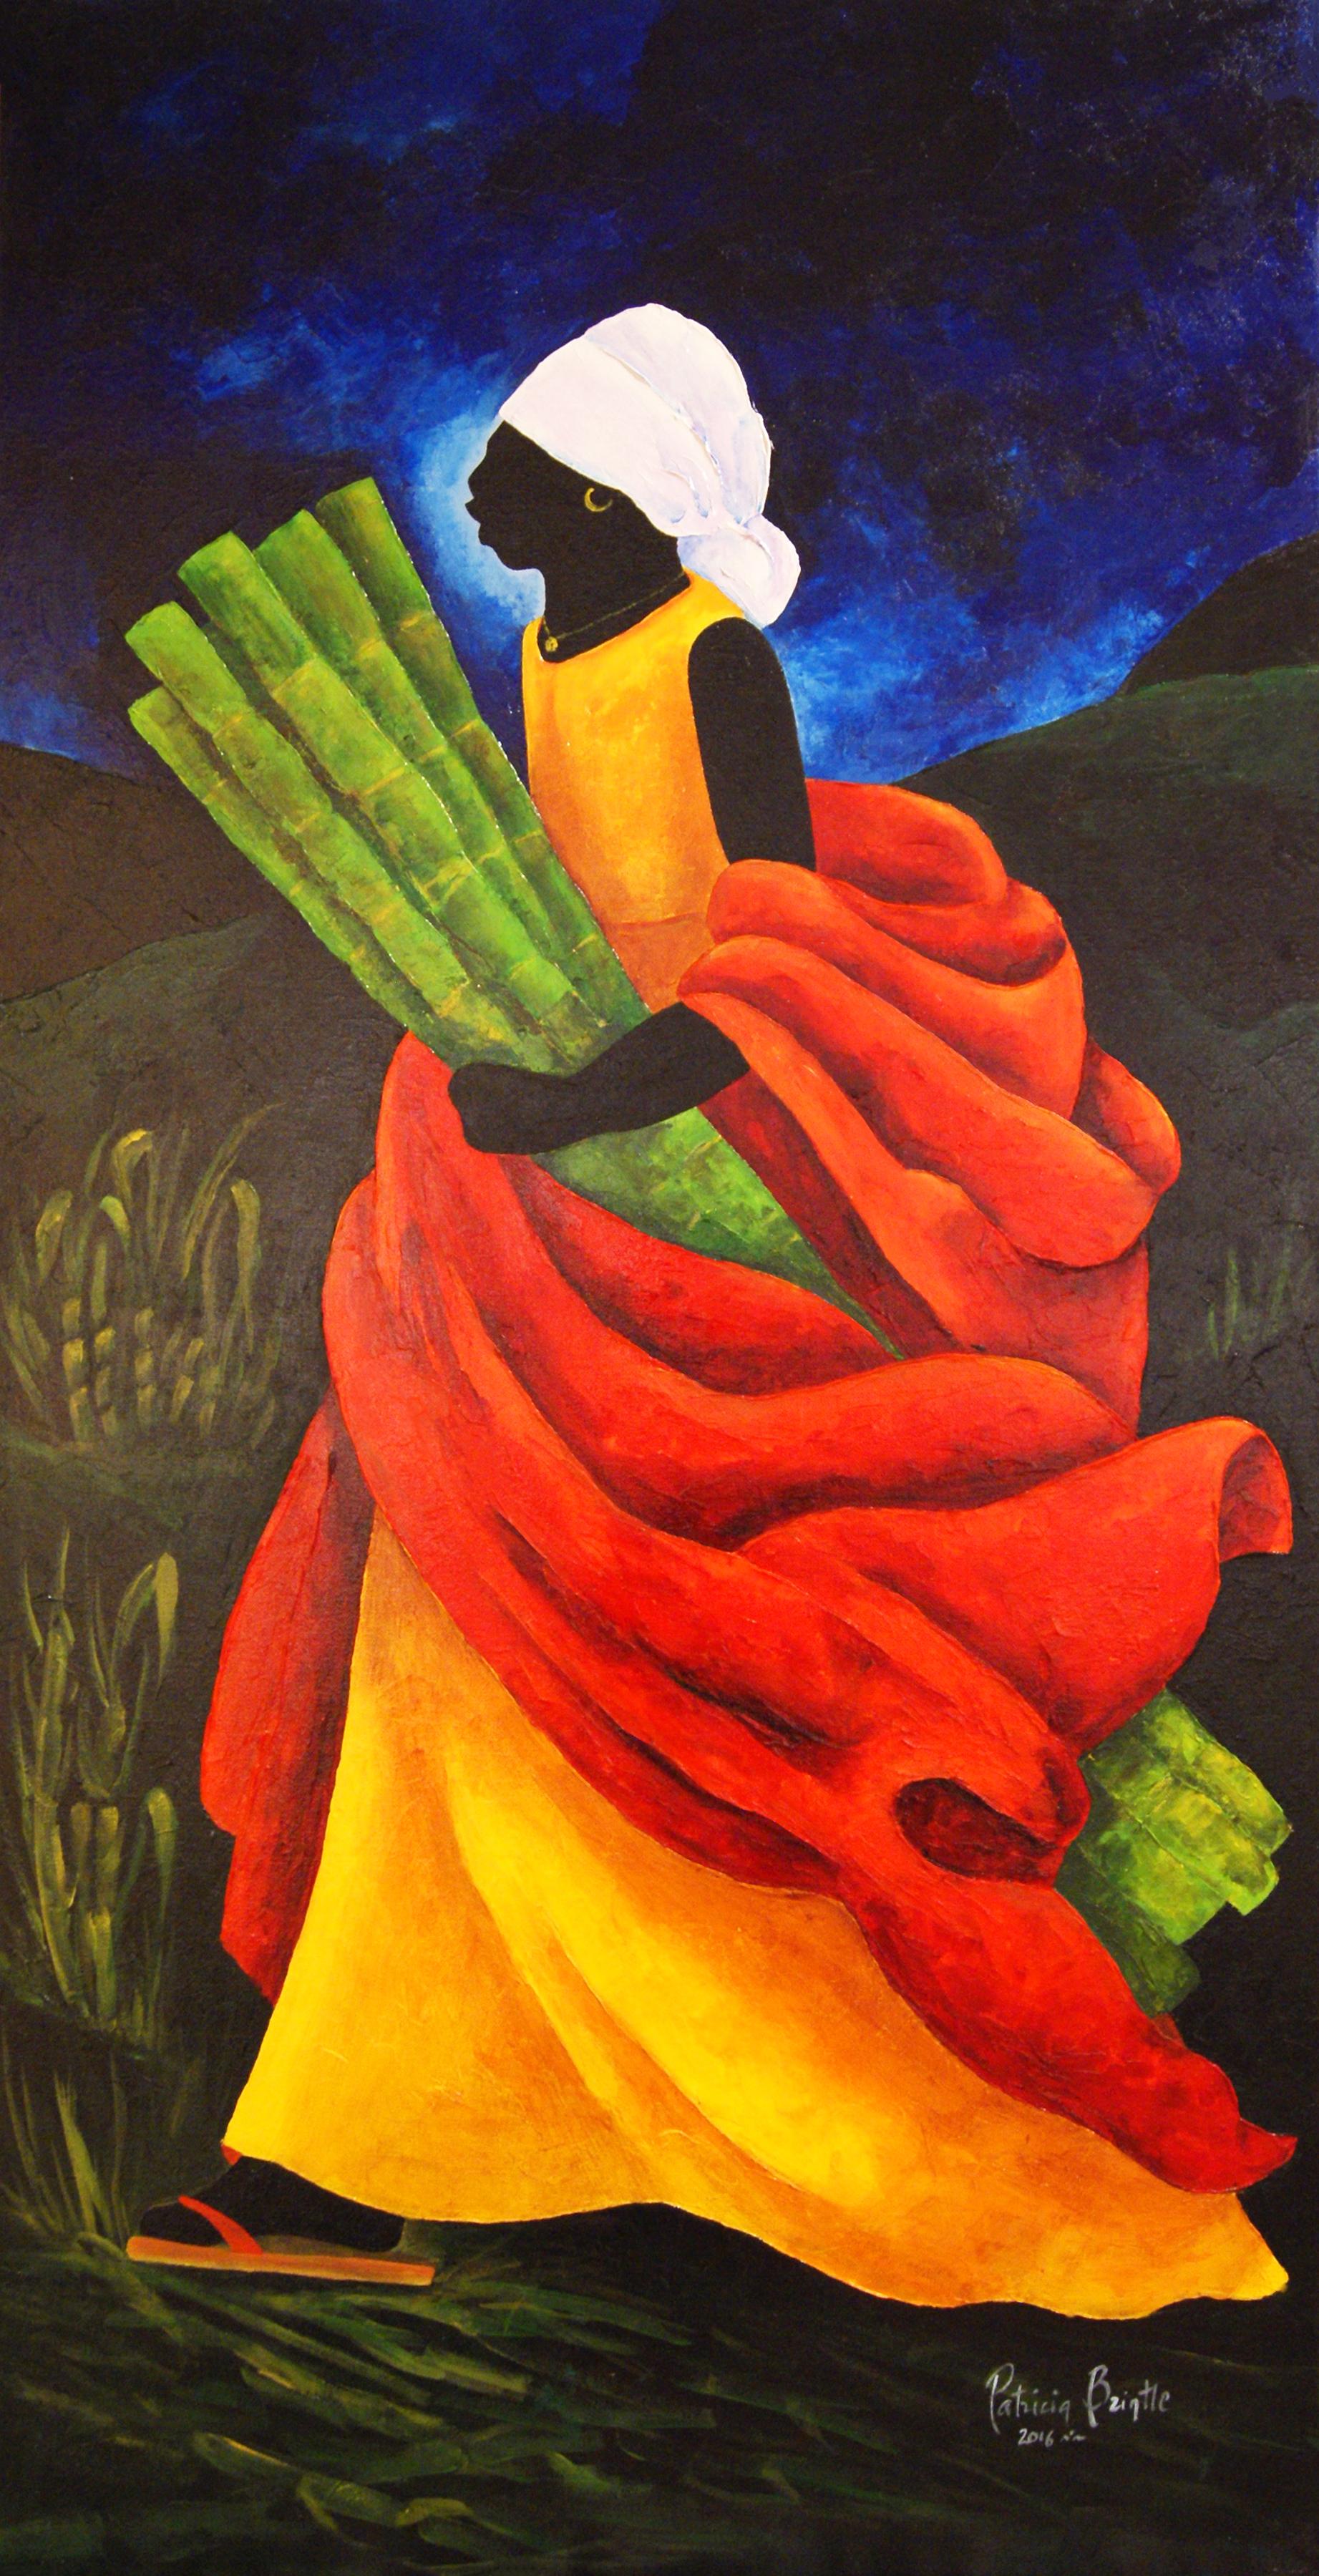 28 - Season Sugarcane II by Patricia Brintle